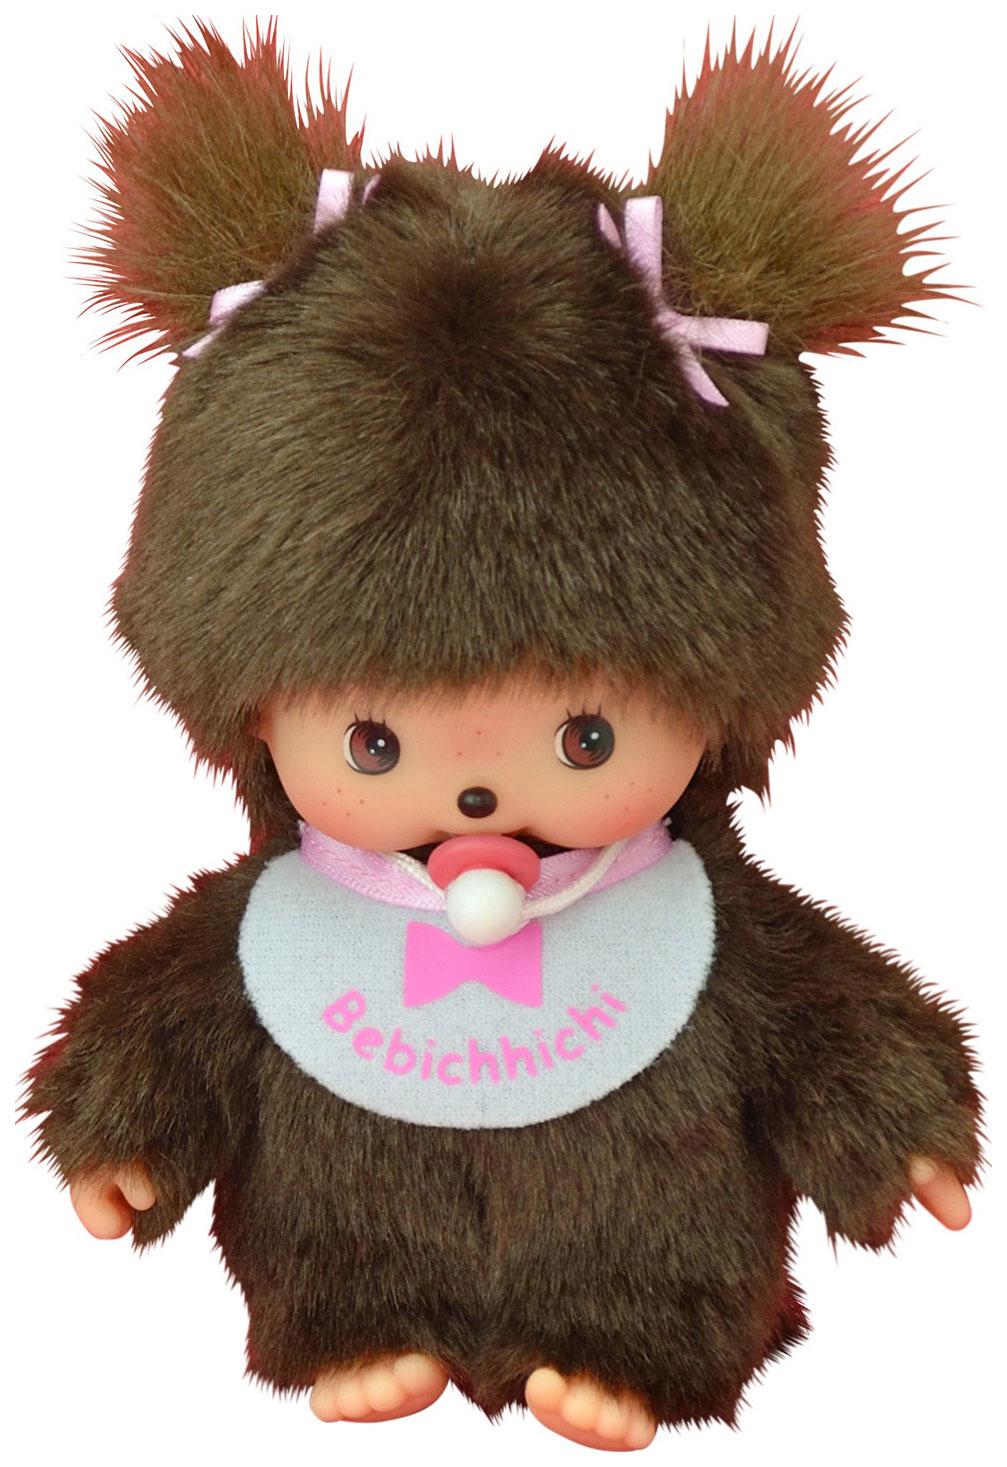 Купить Мягкая игрушка Bebichhichi Девочка в розовом слюнявчике 15 см, Monchhichi, Куклы